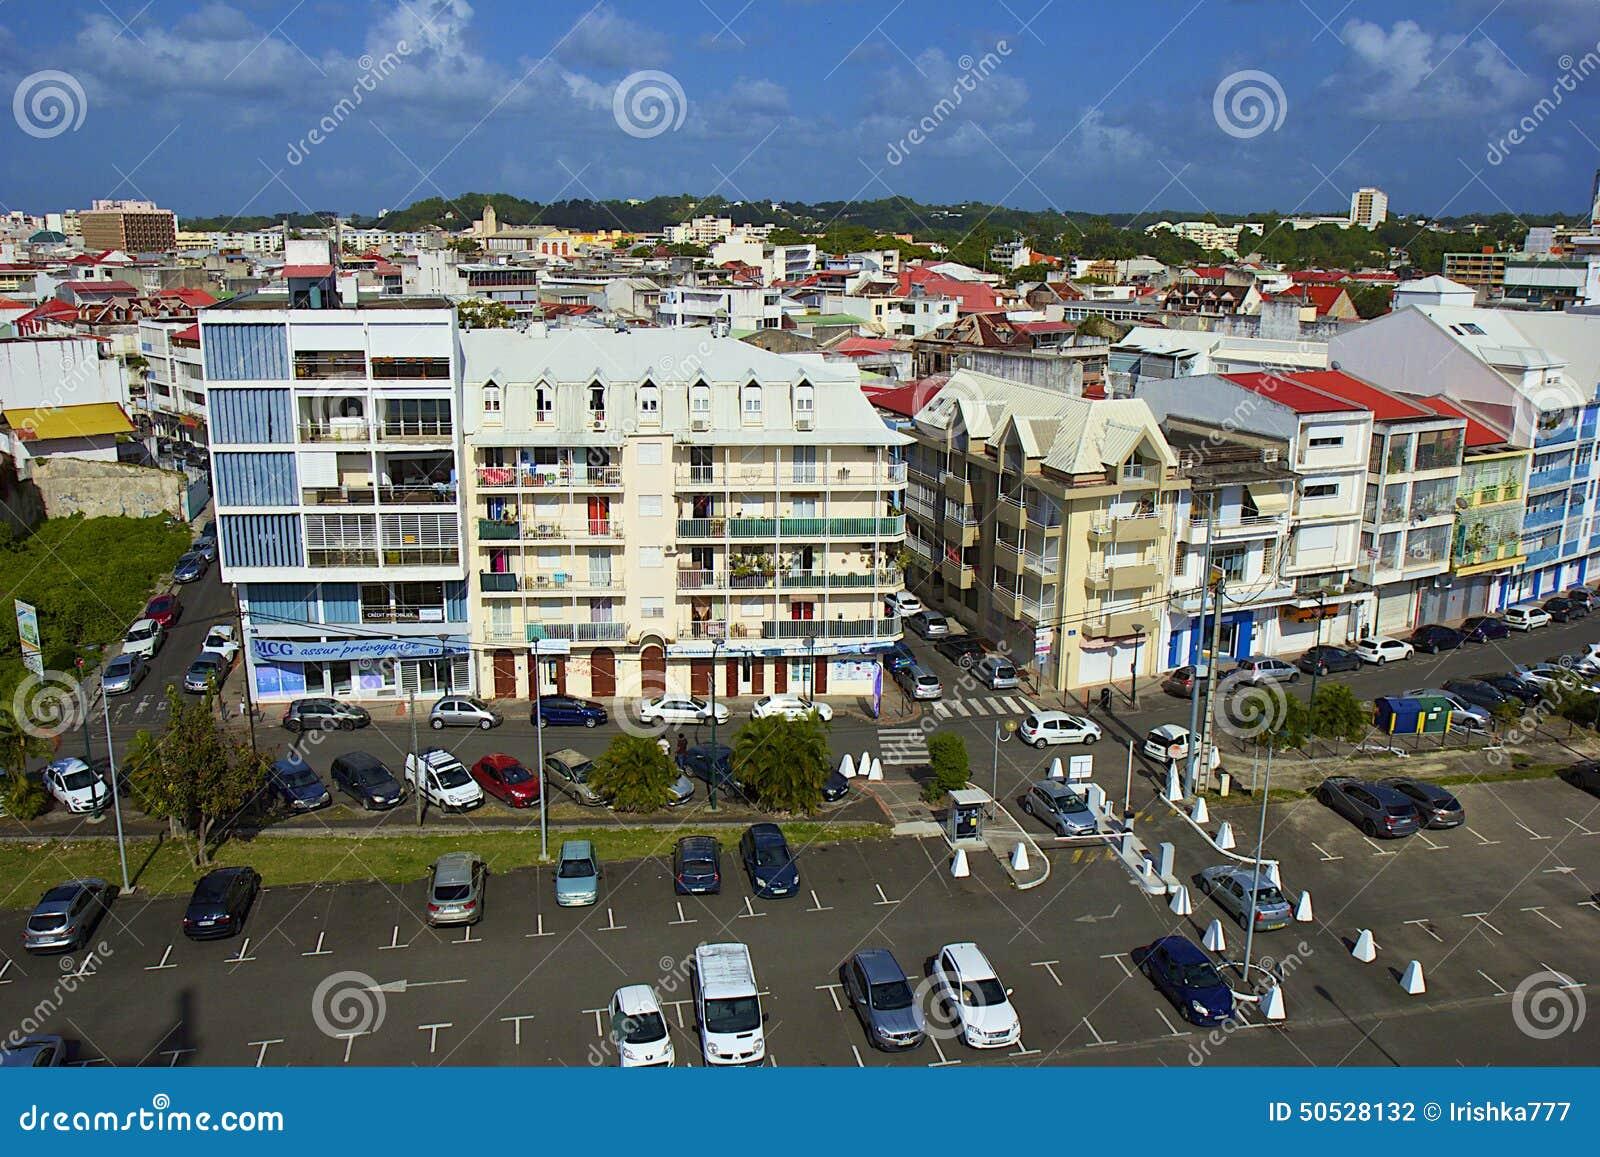 Mulheres Sozinhas Capital Guadeloupe-5776